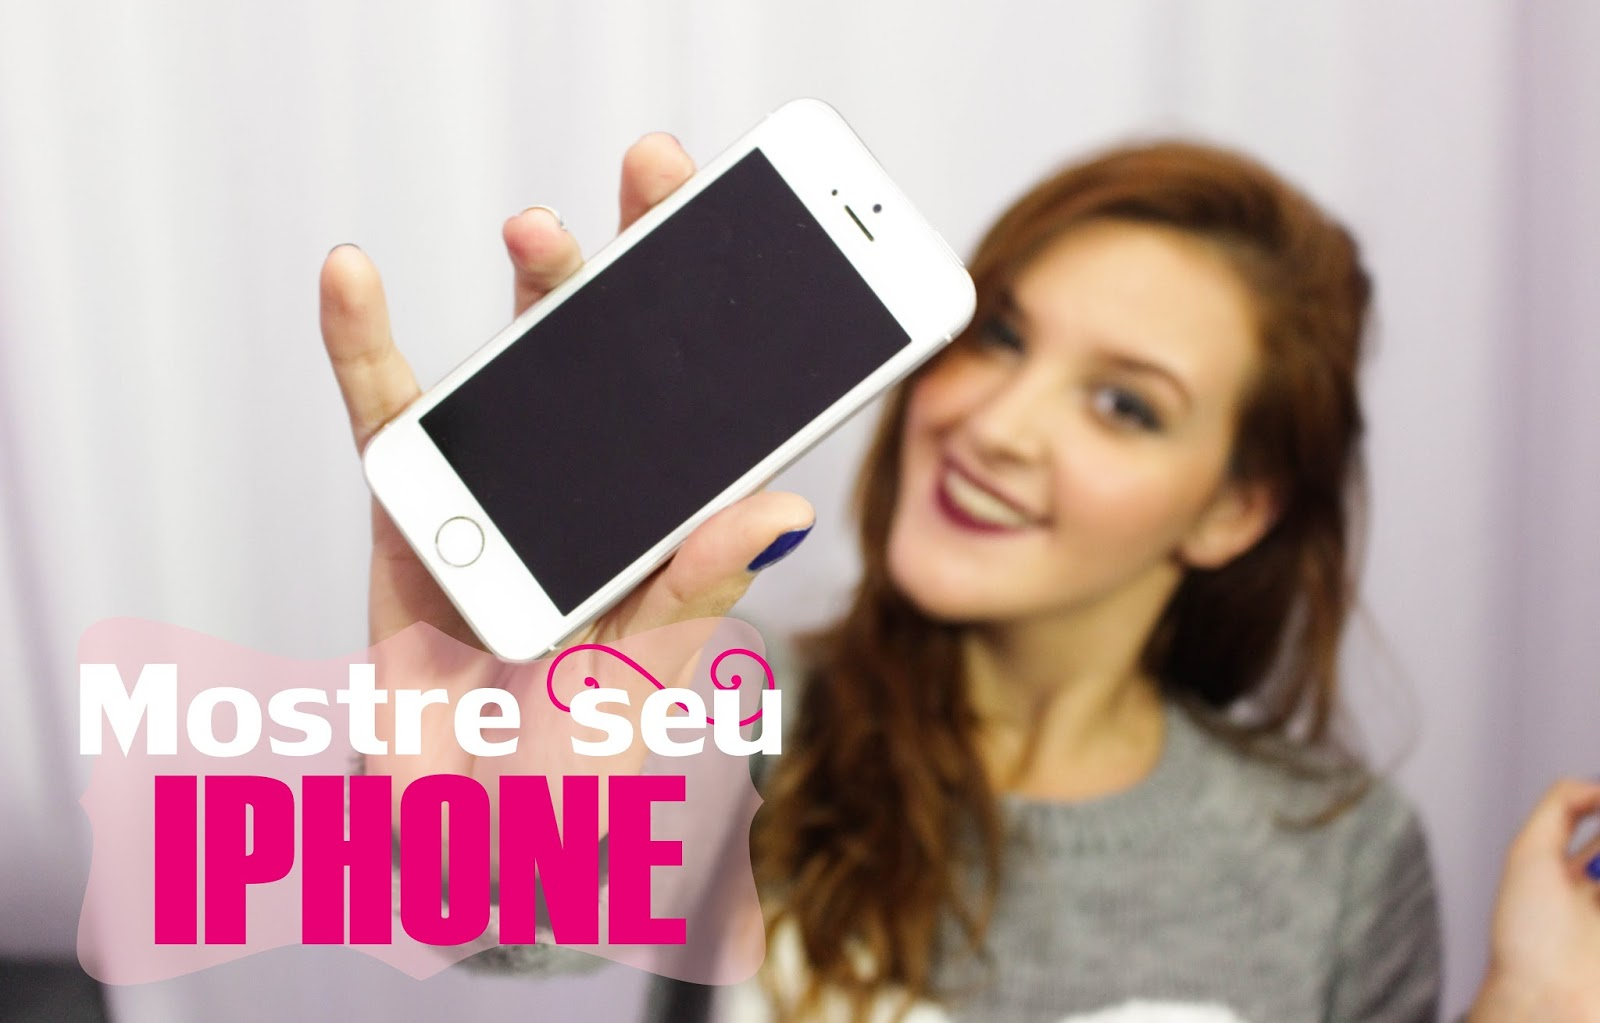 Le petit blondie tag mostre seu iphone aplicativos for Mostre como